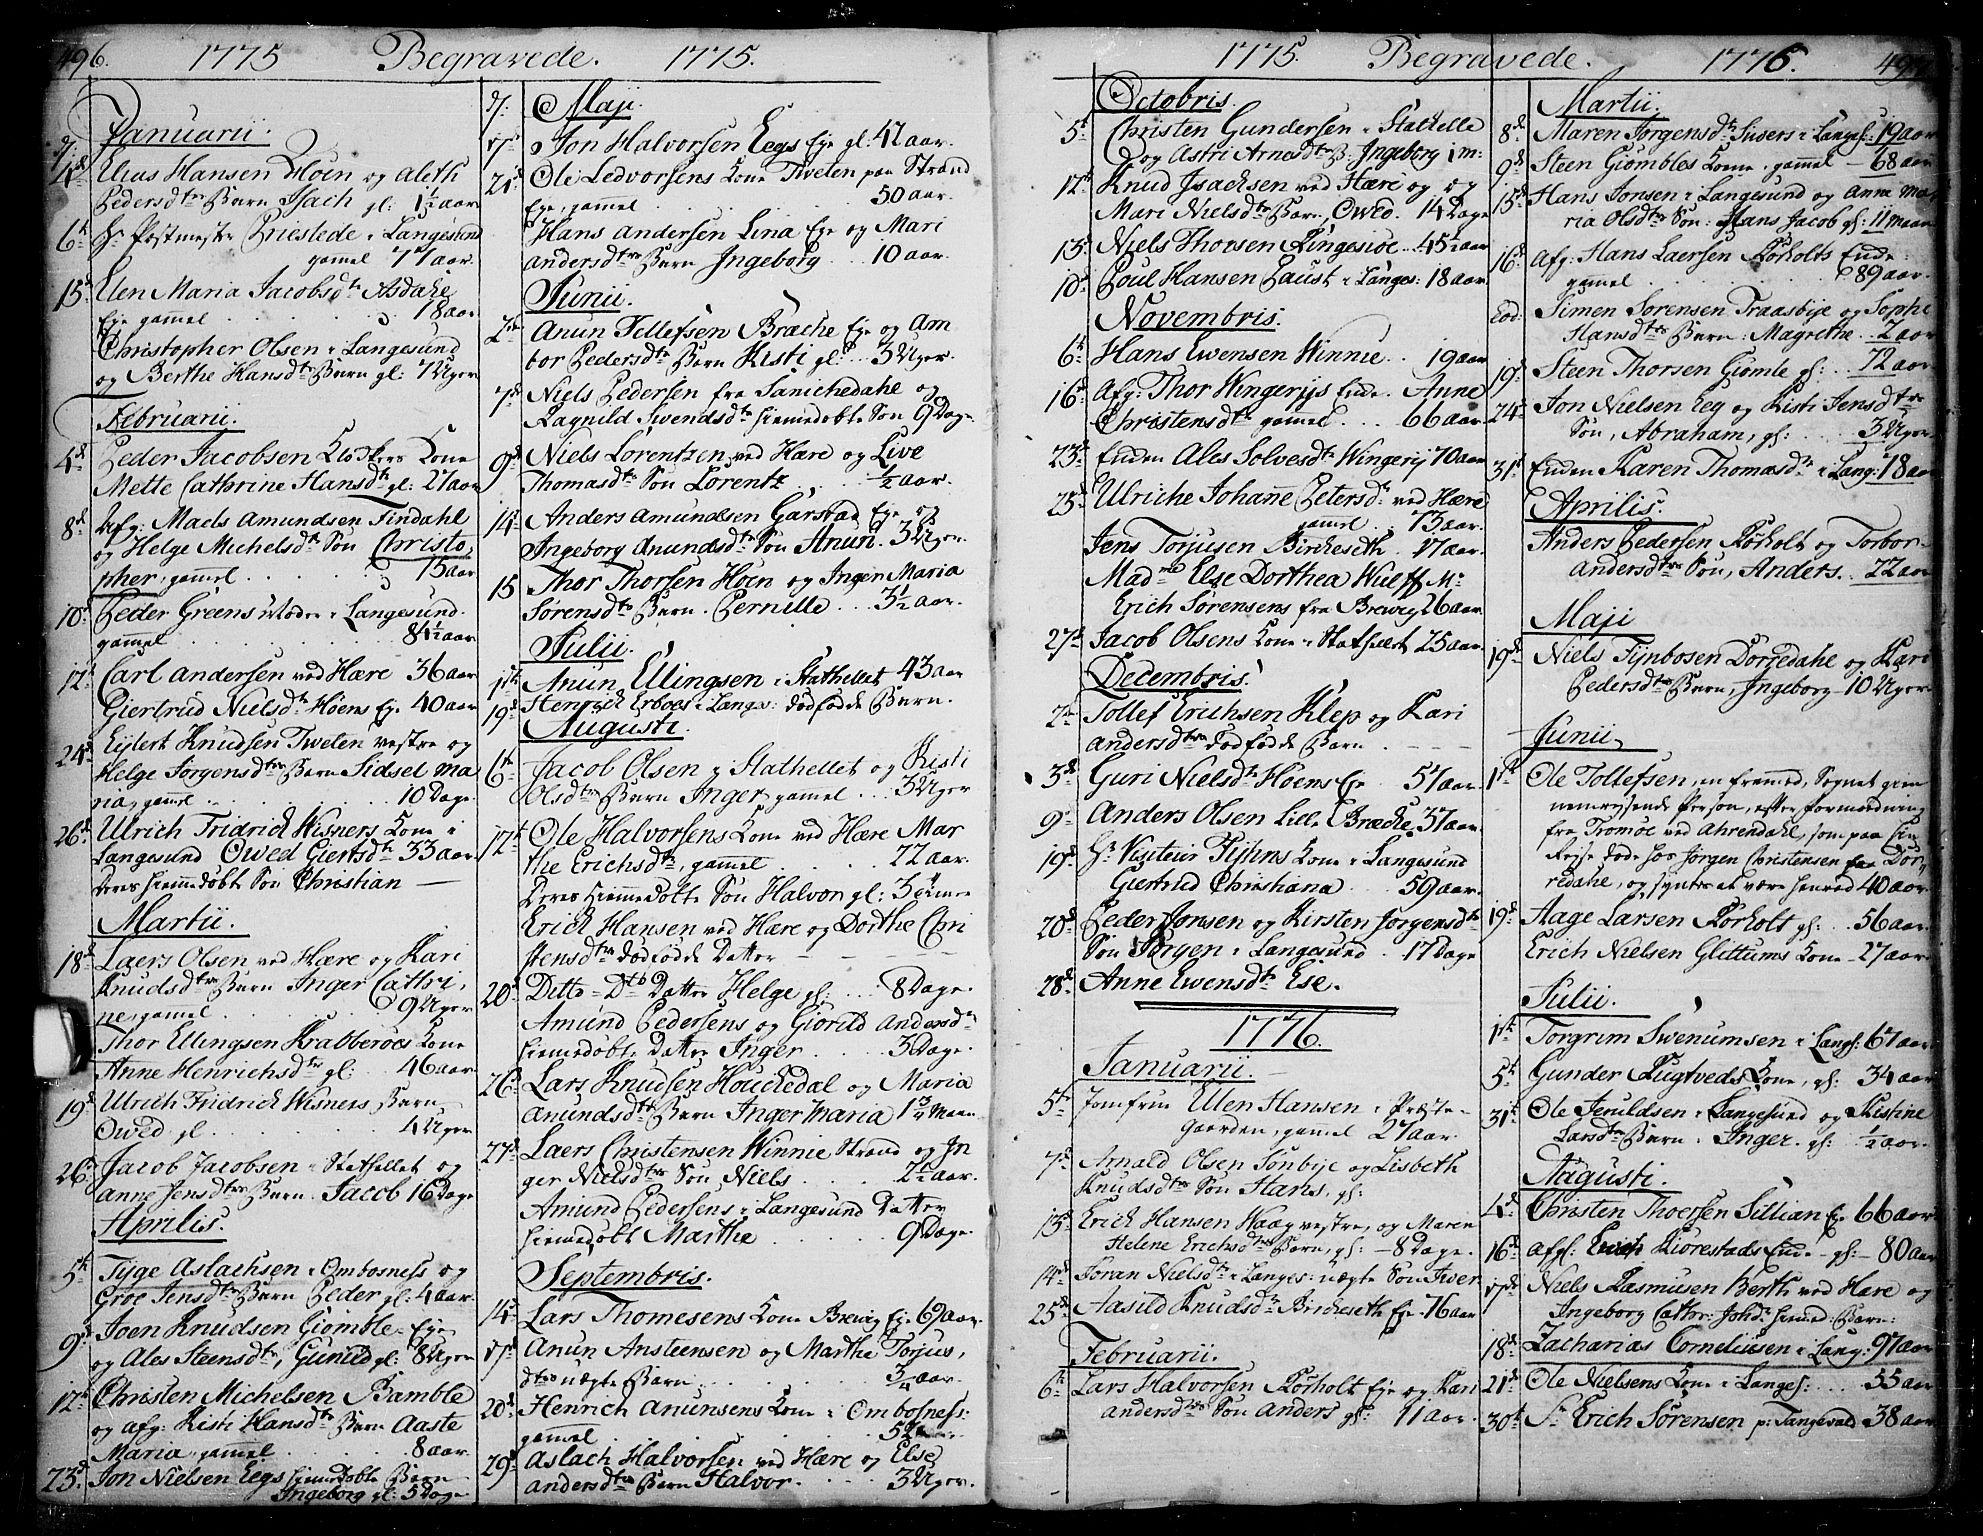 SAKO, Bamble kirkebøker, F/Fa/L0002: Ministerialbok nr. I 2, 1775-1814, s. 496-497